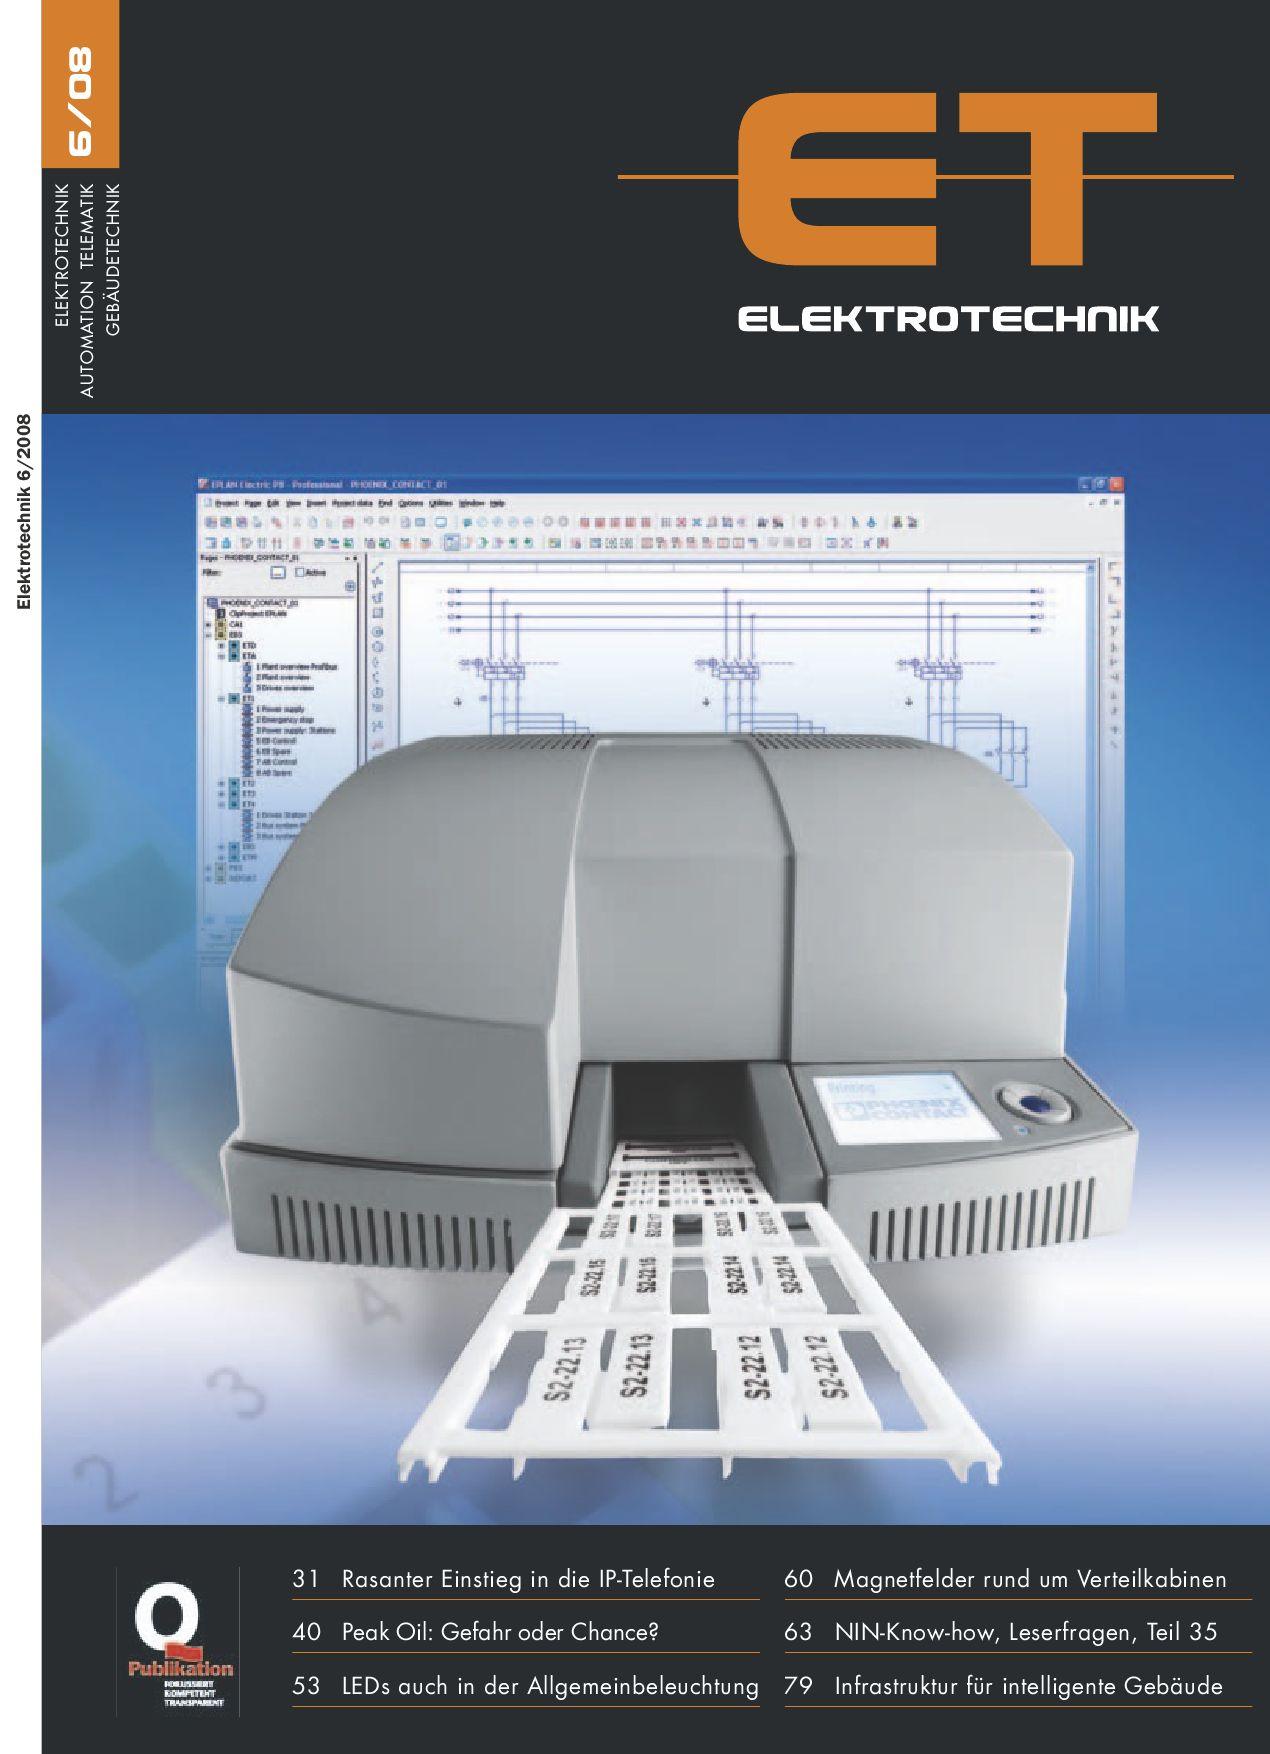 Elektrotechnik 2008/06 by Daniel Gugger - issuu